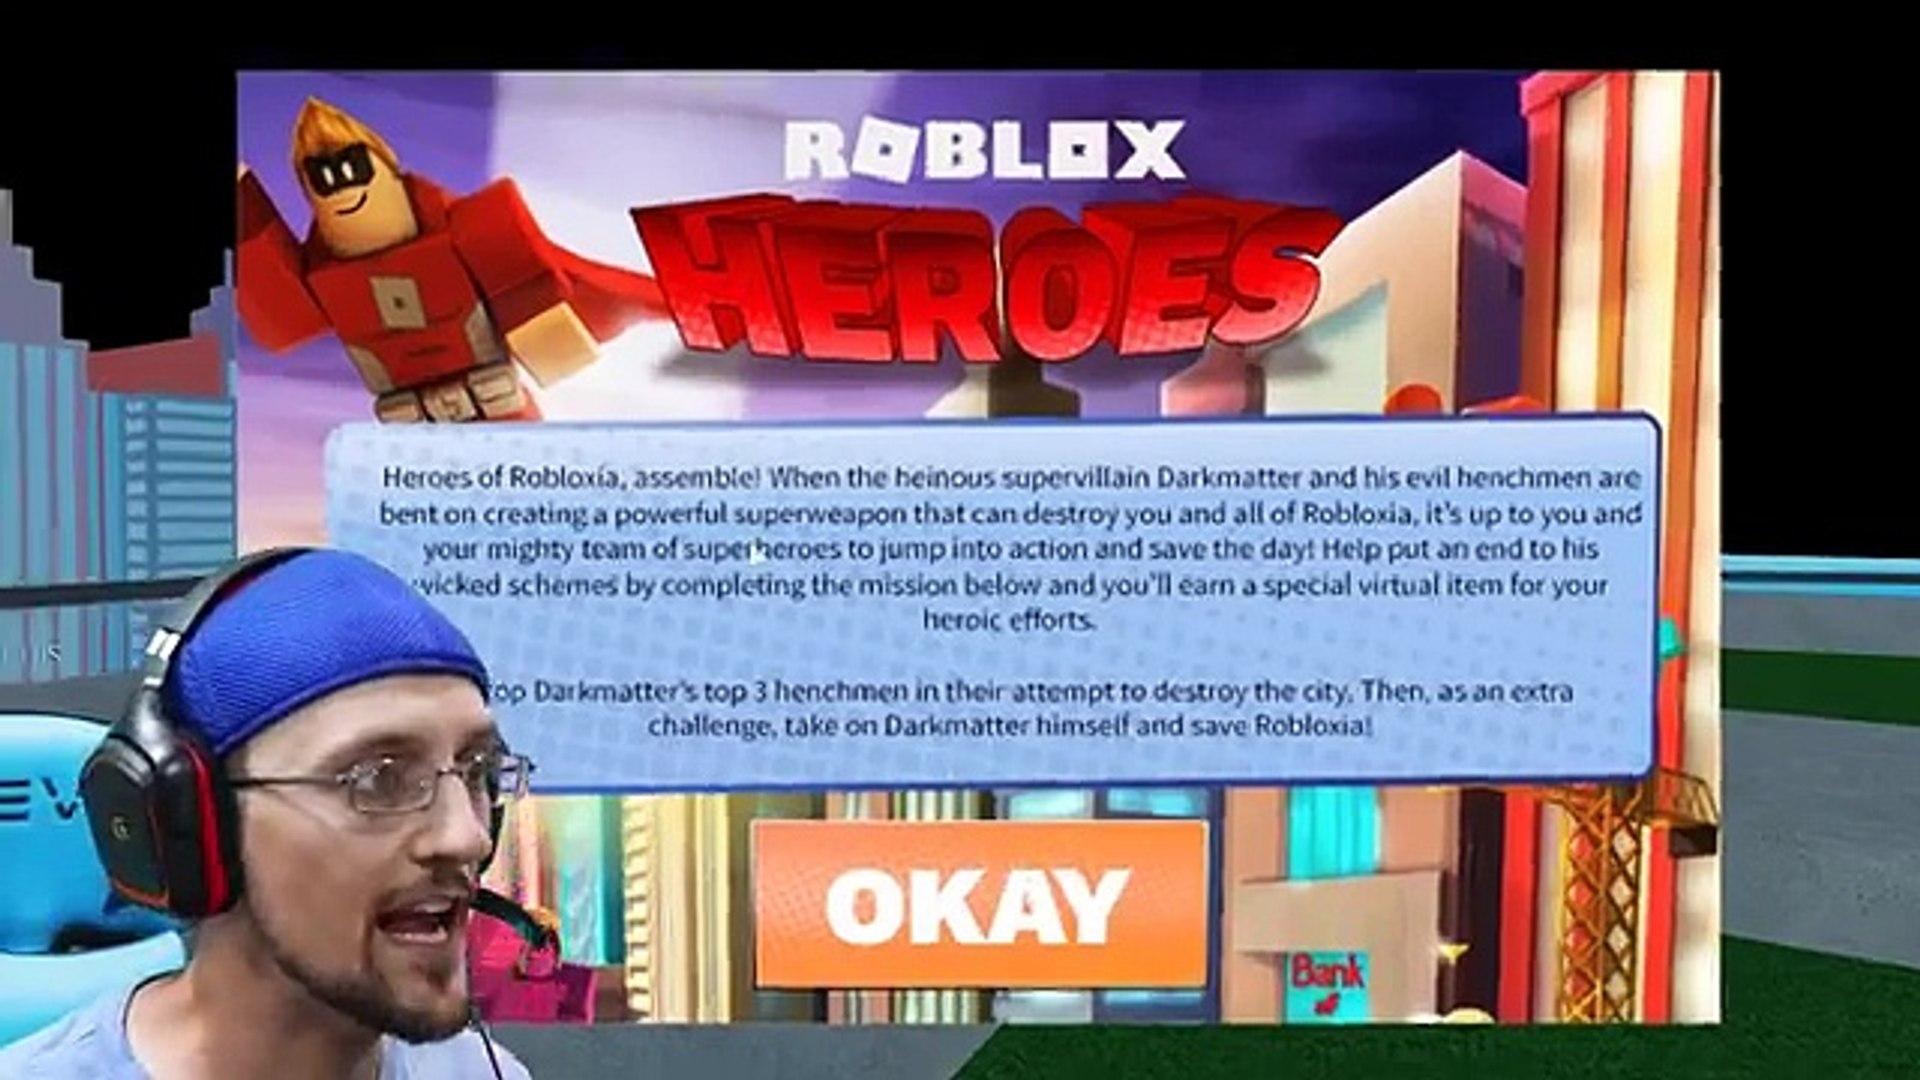 Roblox Vs Bad Baby Shawn Fgteev Super Heroes Of Robloxia Gym Tycoon New Skin Pixel Gun Pt 25 - fgteev roblox tycoon superhero